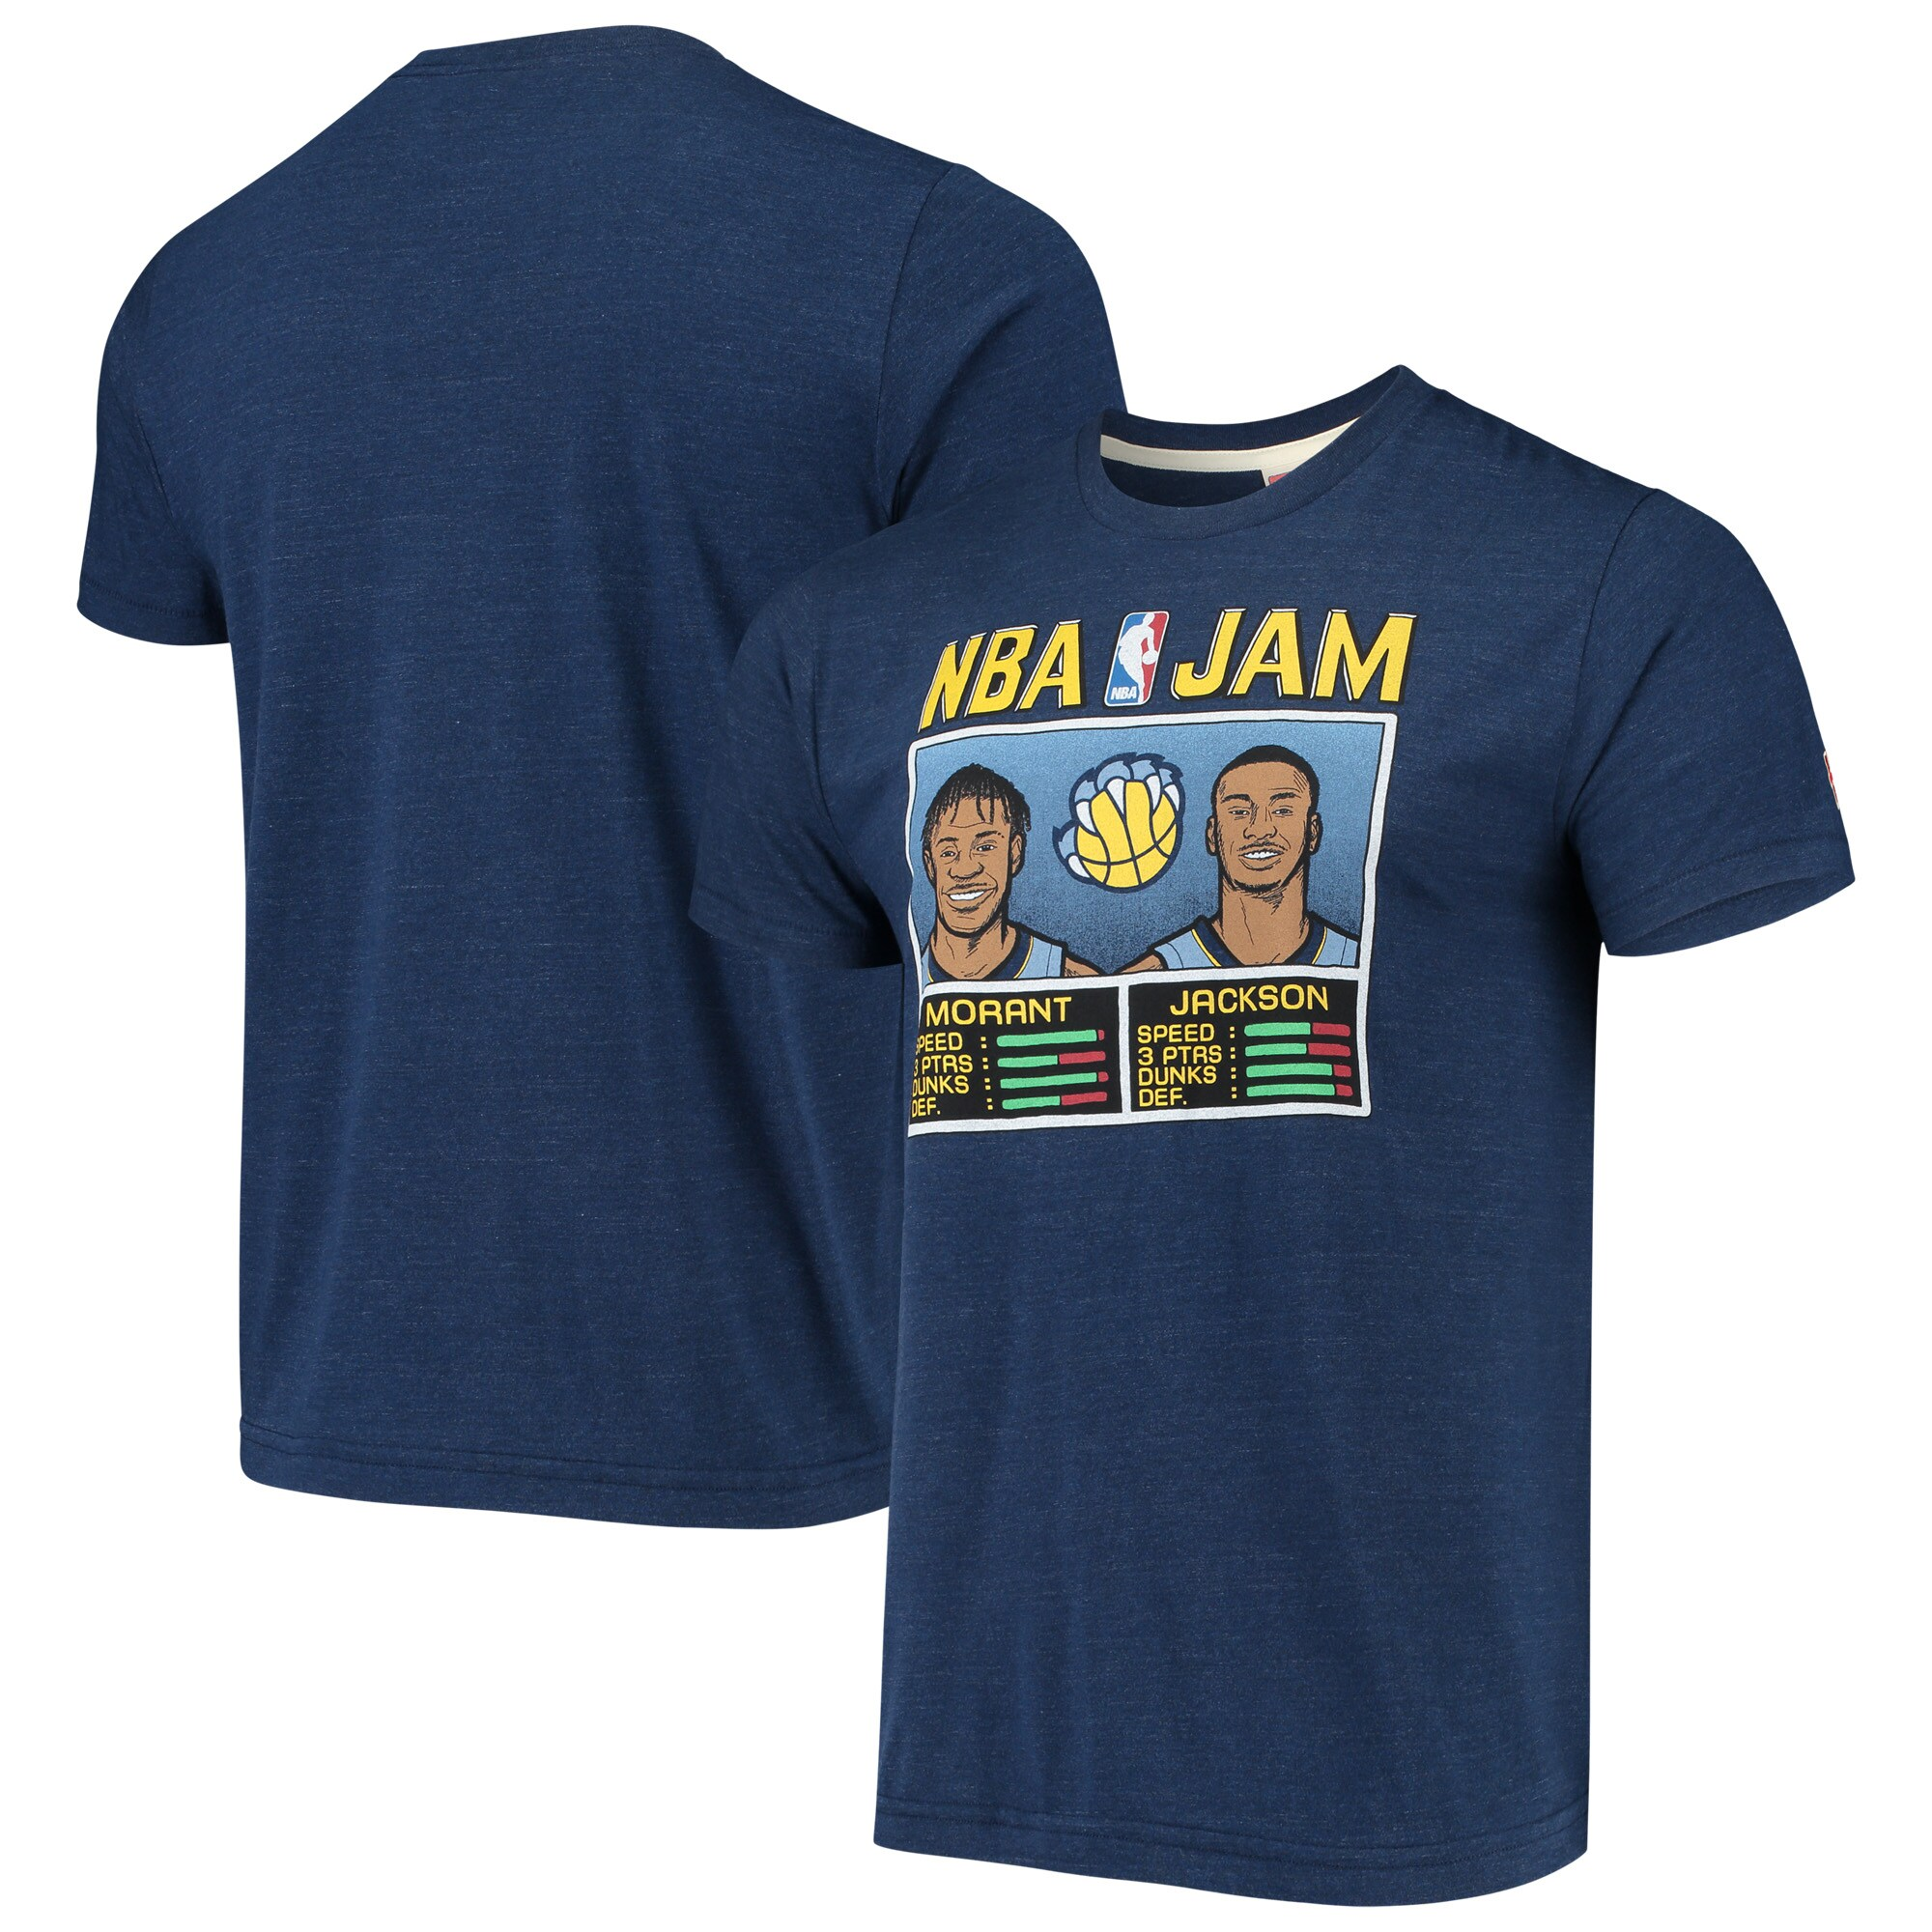 Ja Morant & Jaren Jackson Jr. Memphis Grizzlies NBA Jam T-Shirt - Navy